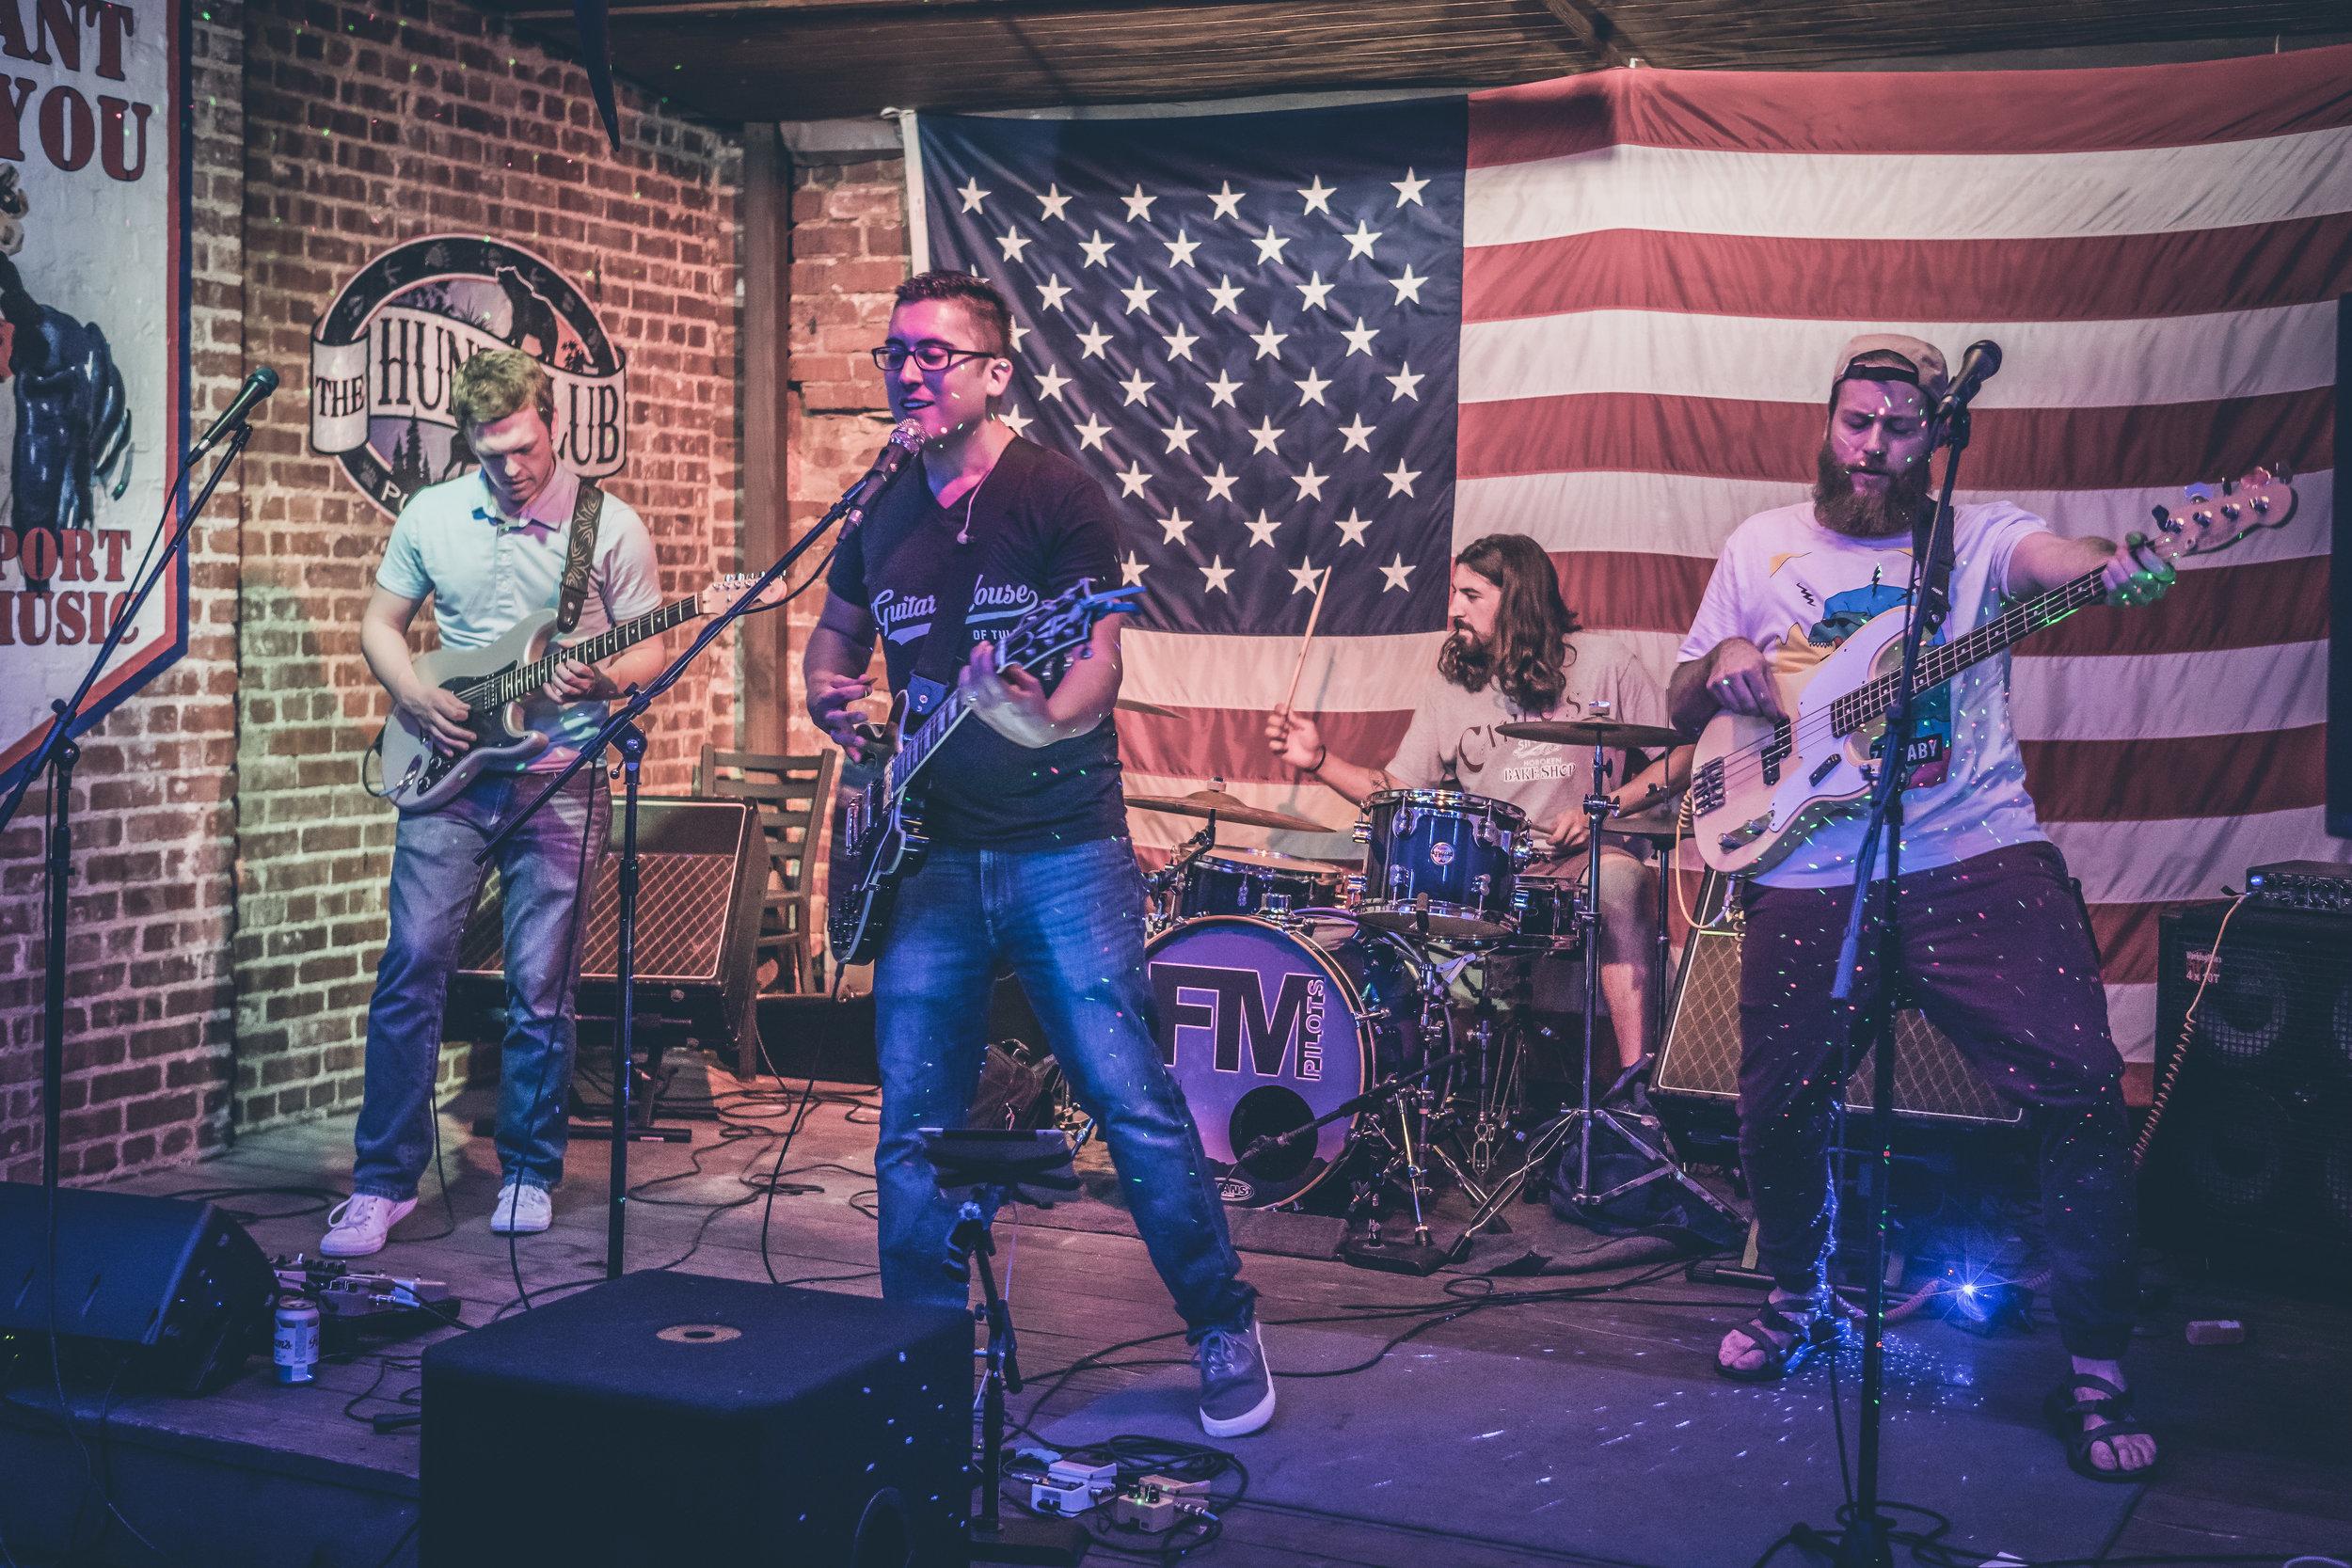 FM Pilots - Tulsa Rock Band - The Hunt Club Tulsa, OK 061016-6.jpg